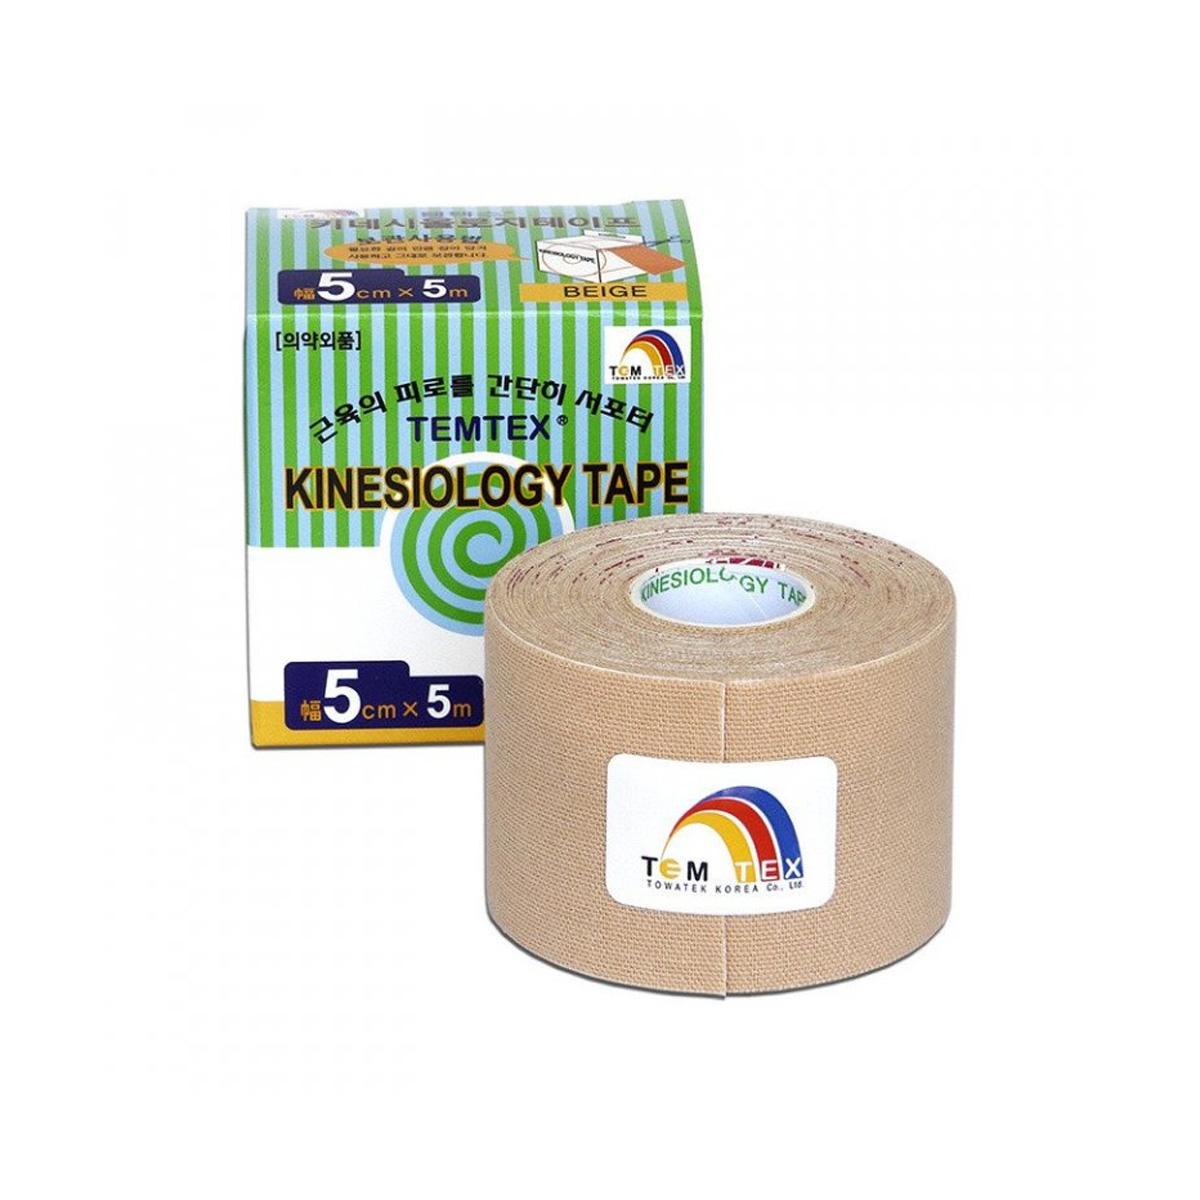 Temtex kinesio tape Classic béžová 5cm x 5m